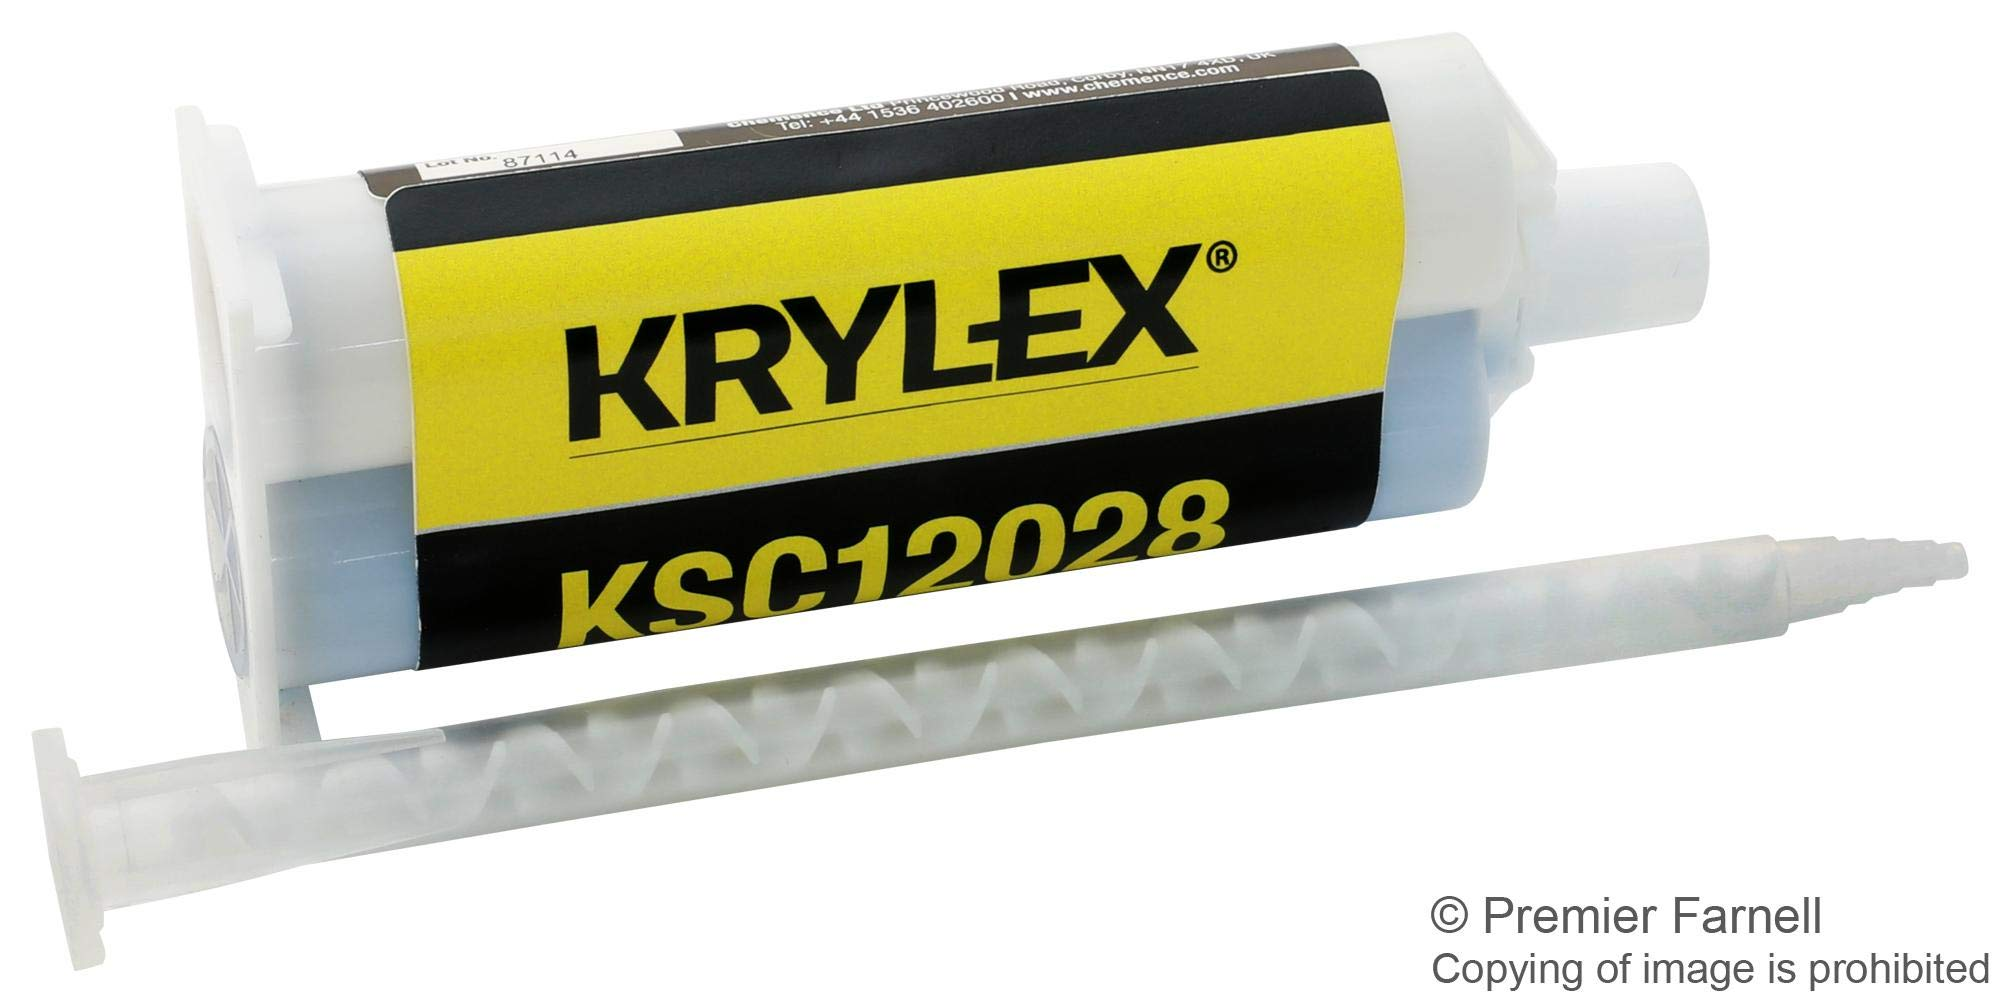 KBX9024, 50G - INSTANT ADHESIVE, CYANOACRYLATE, 50G (Pack of 2) (KBX9024, 50G)